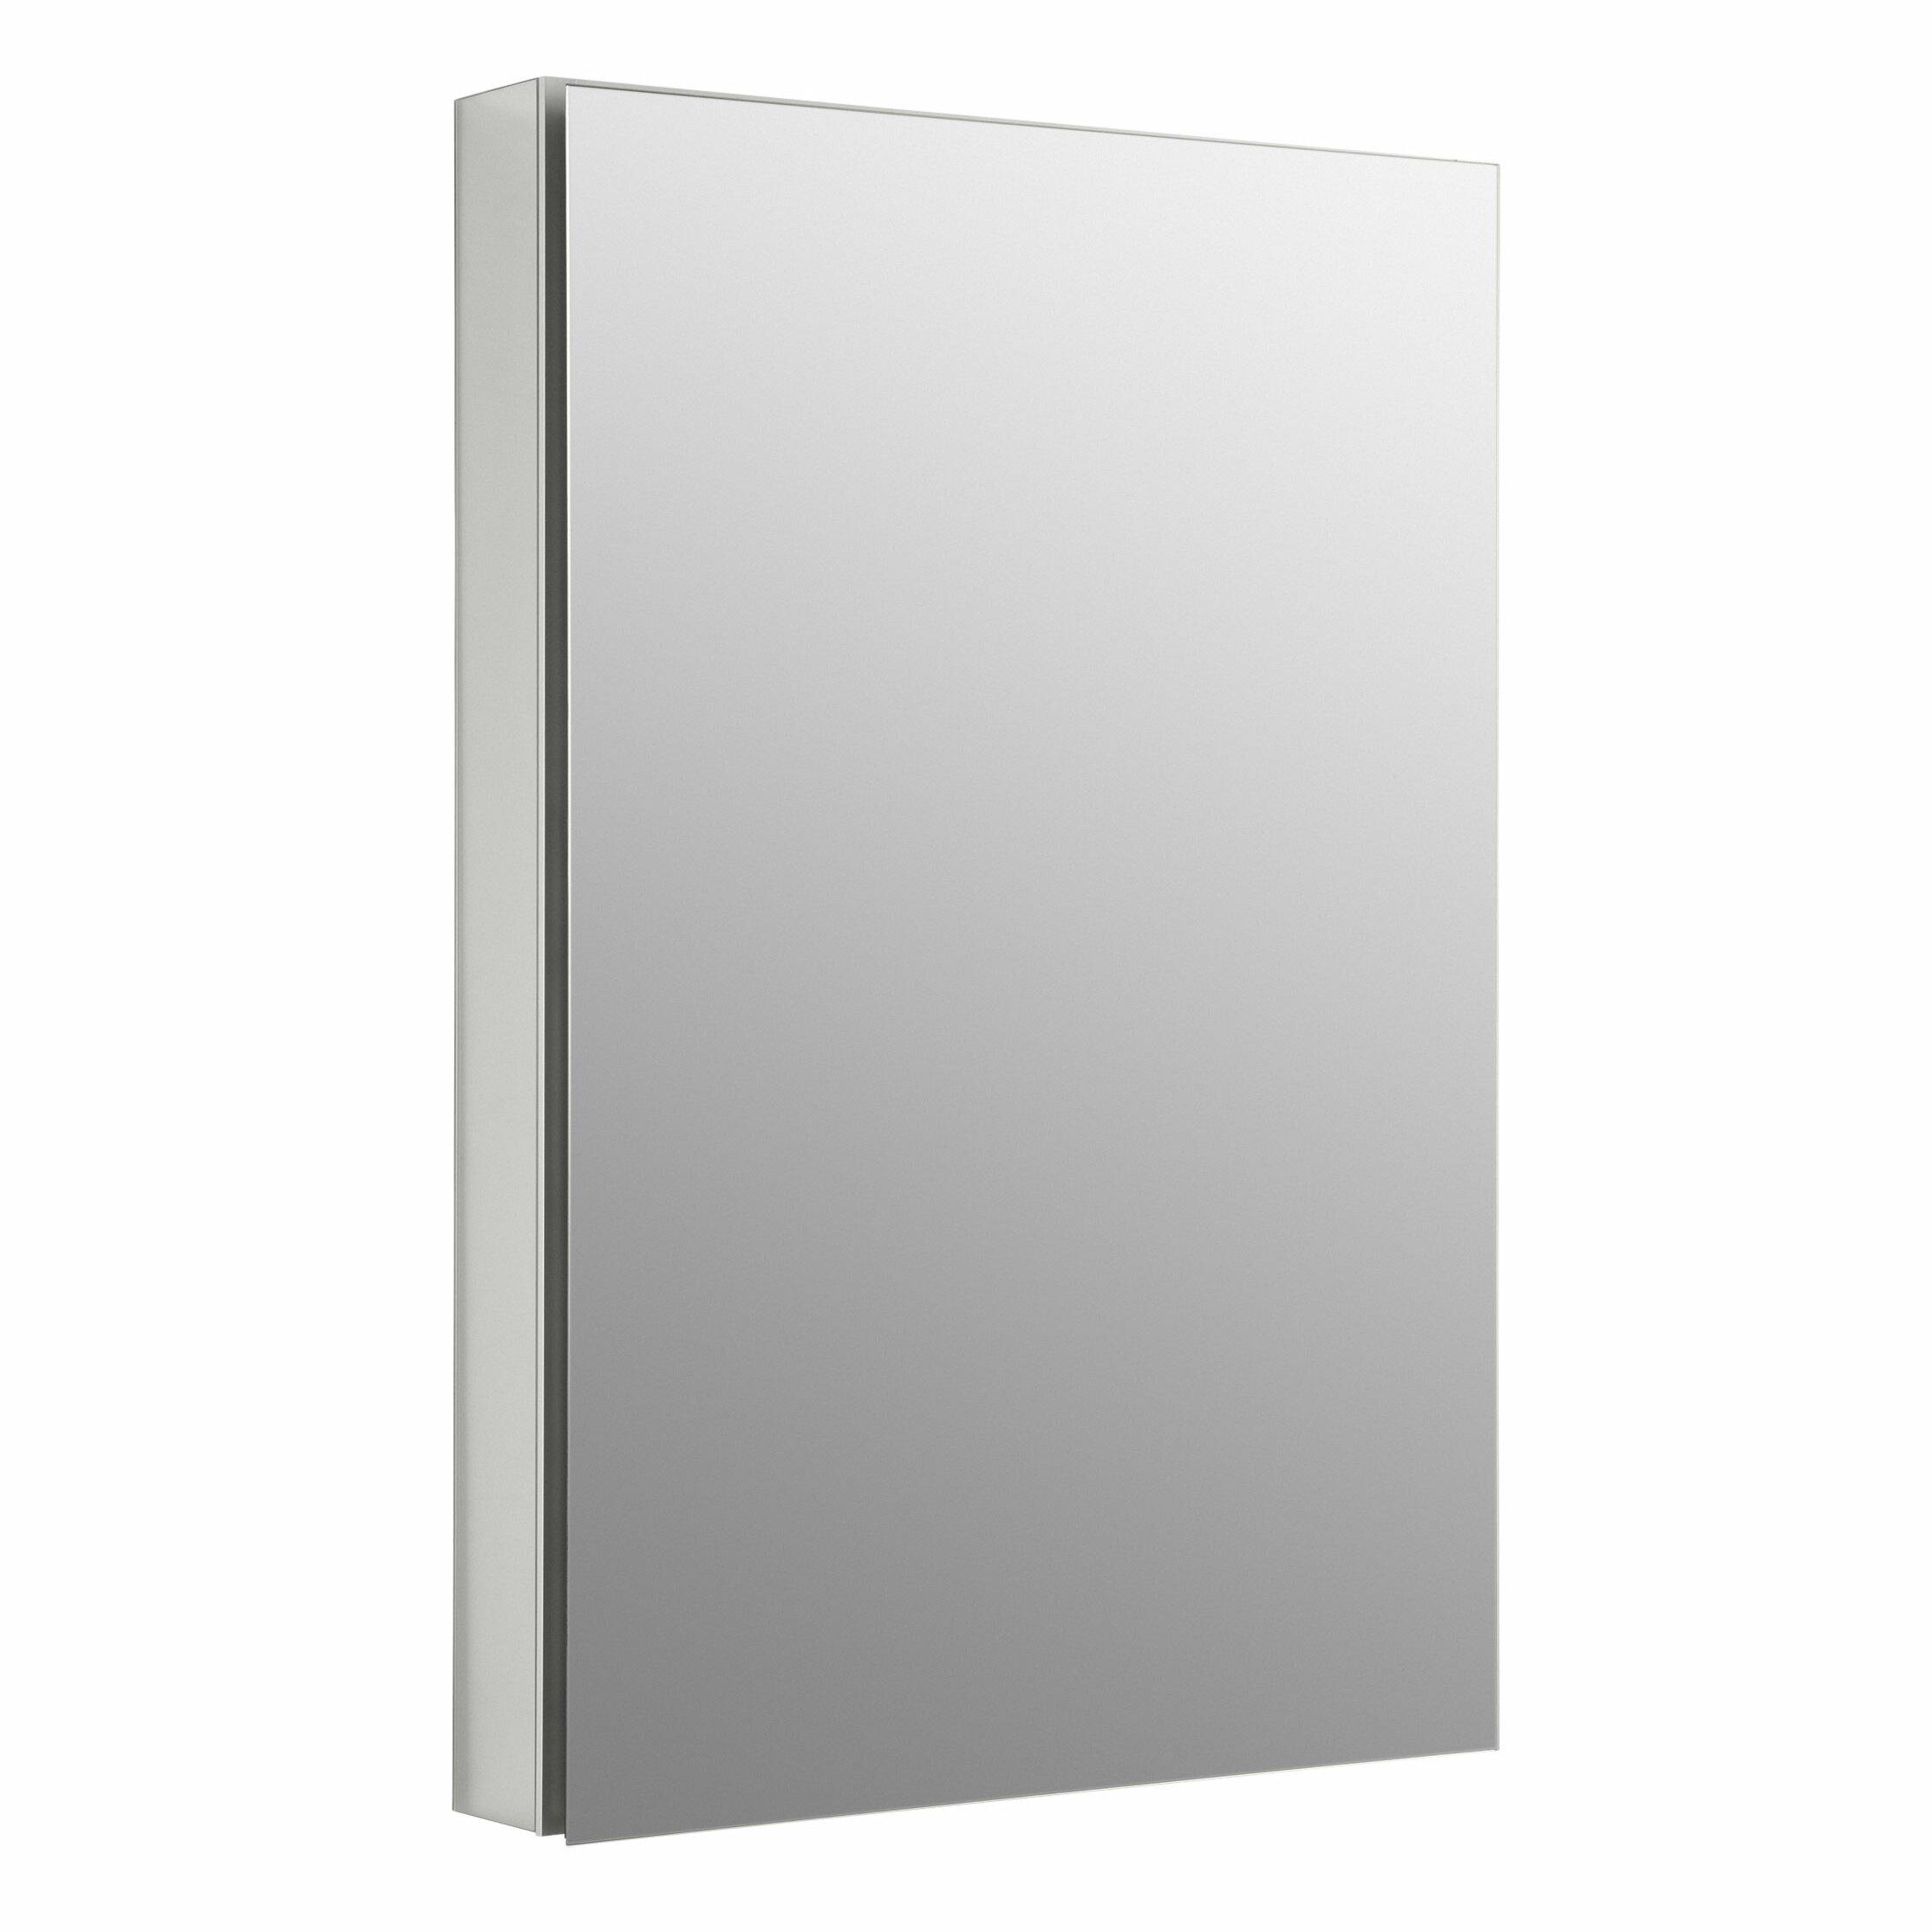 24 X 36 Medicine Cabinet Kohler Catalan 23375 W X 3525 H Aluminum Single Door Medicine